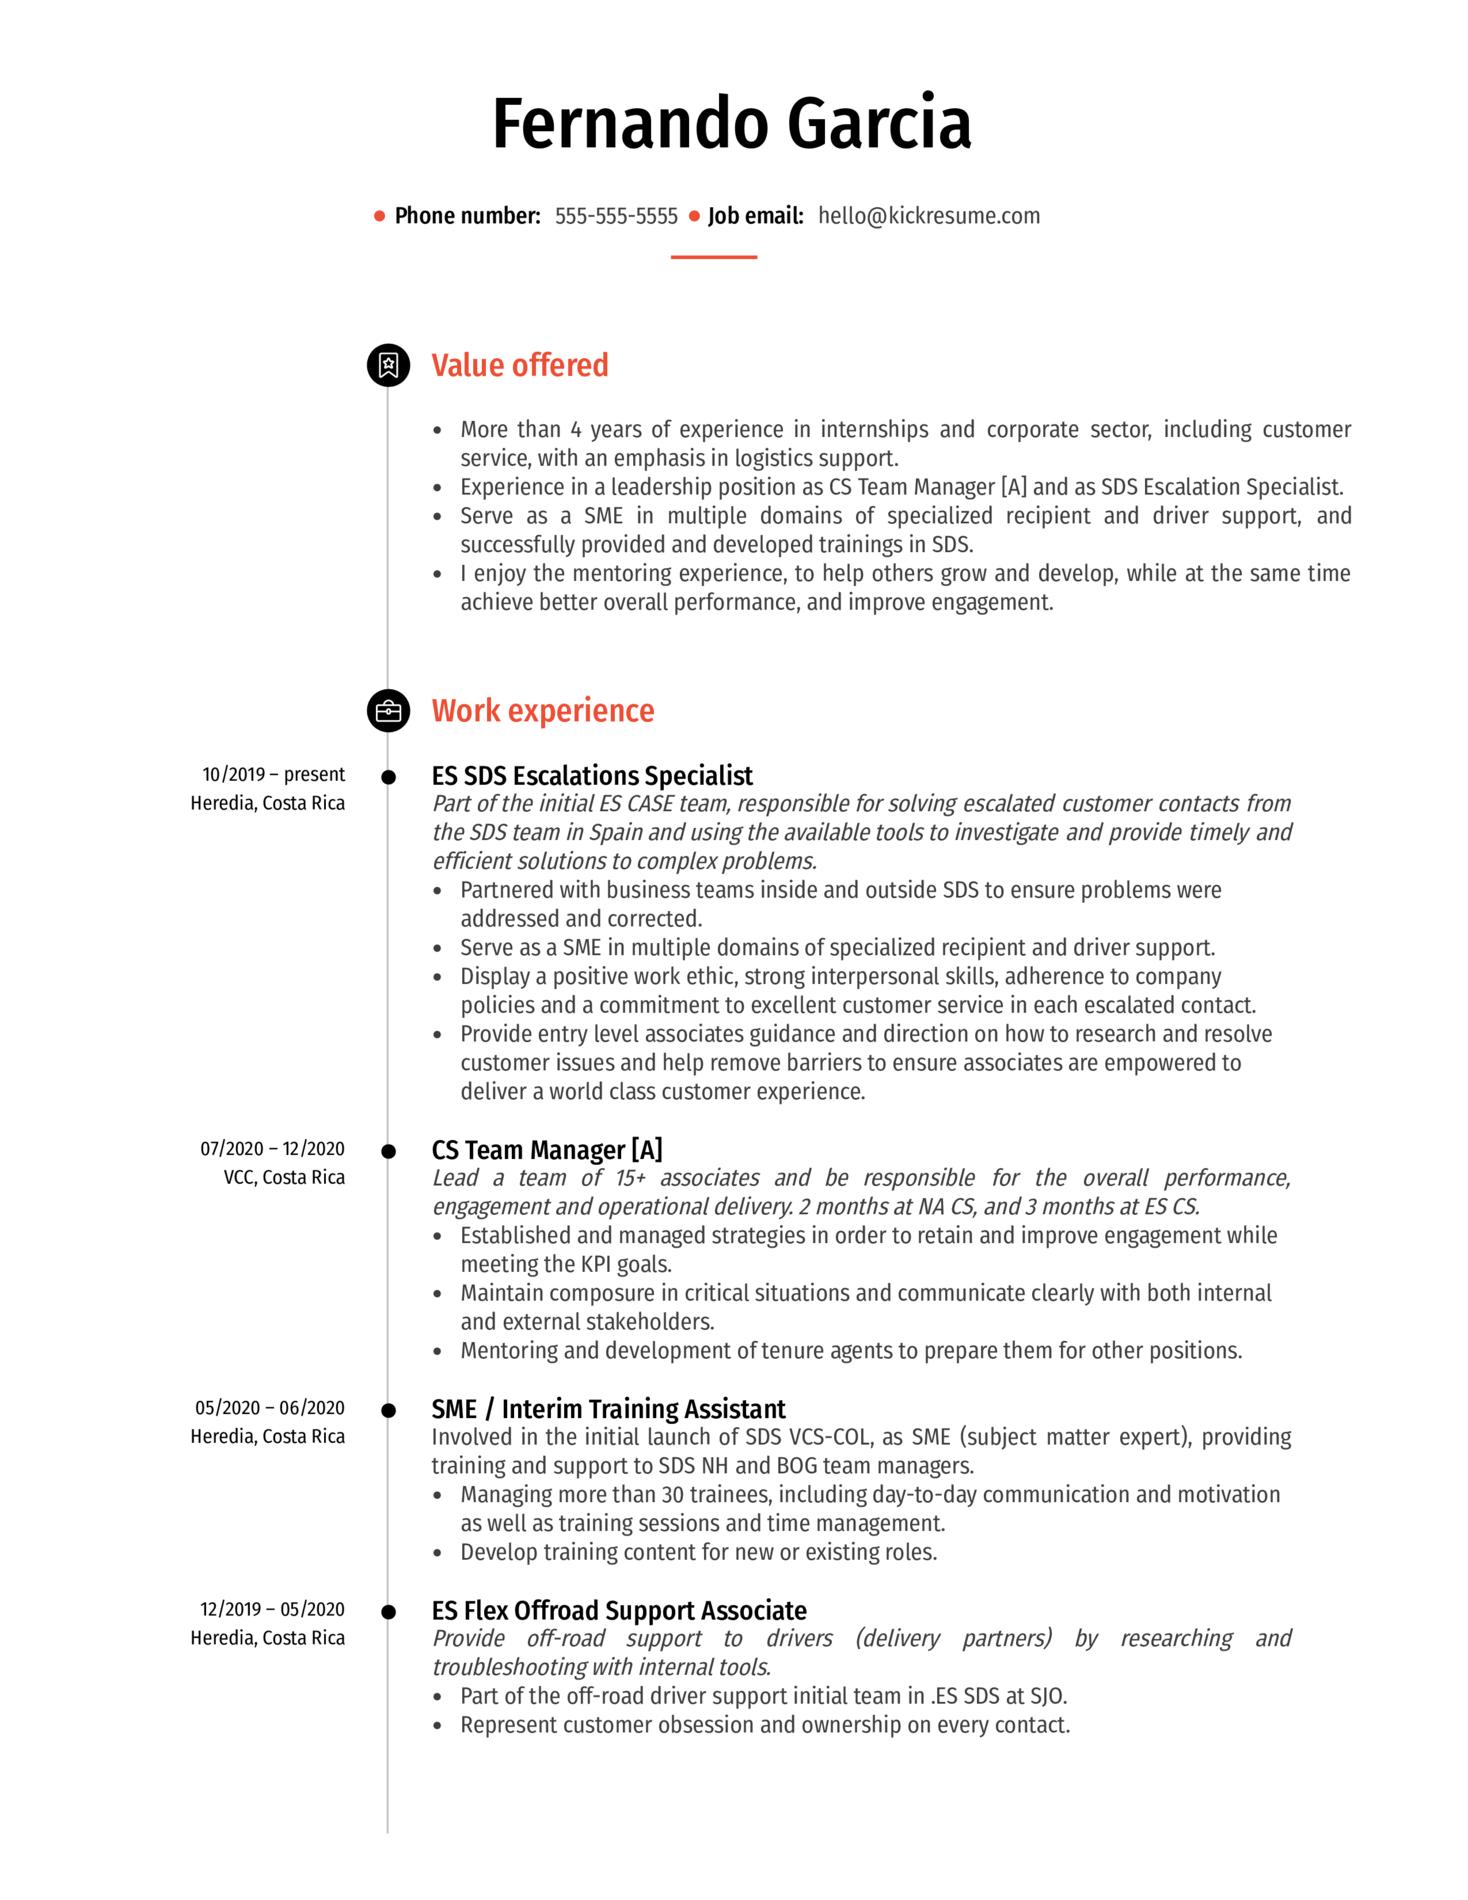 SDS Training Specialist at Amazon Resume Sample (časť 1)